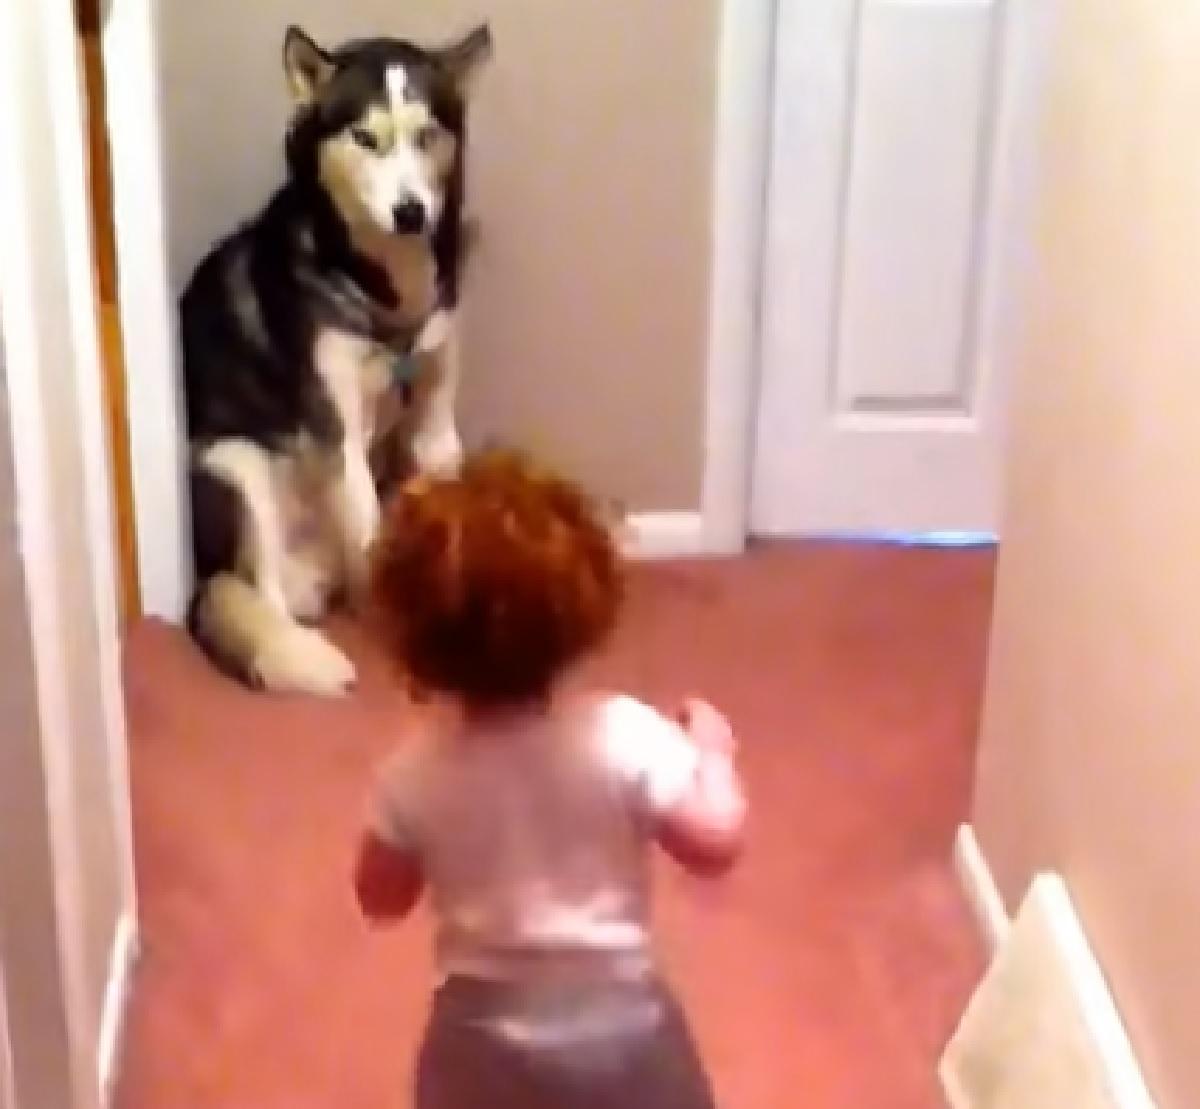 cucciolo husky in fondo corridoio